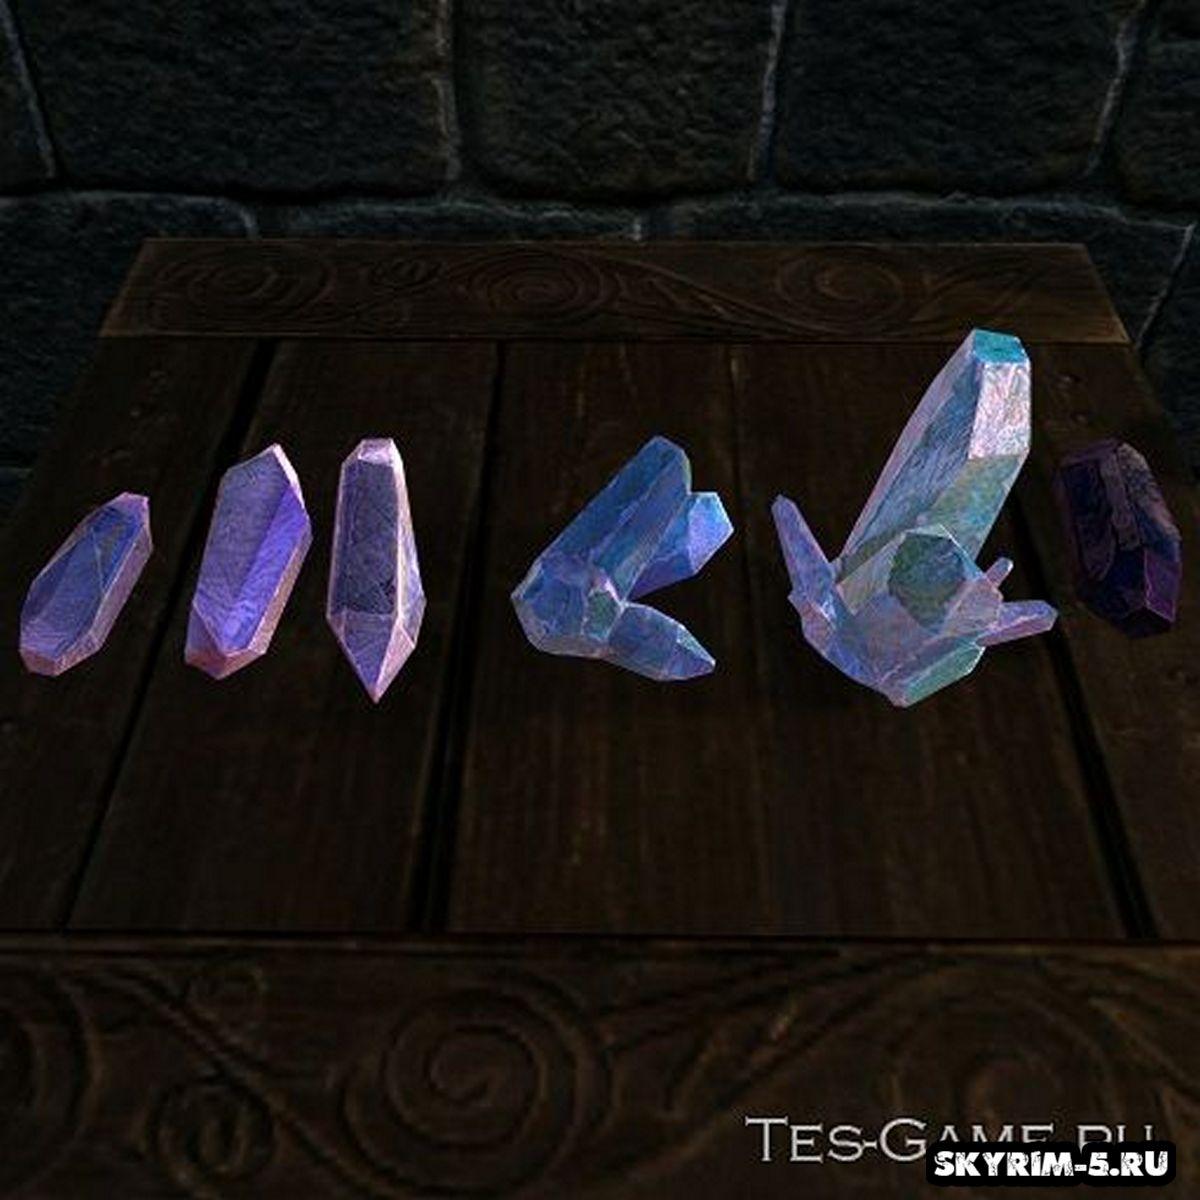 Крафт камней душМоды Скайрим > Геймплей Скайрим